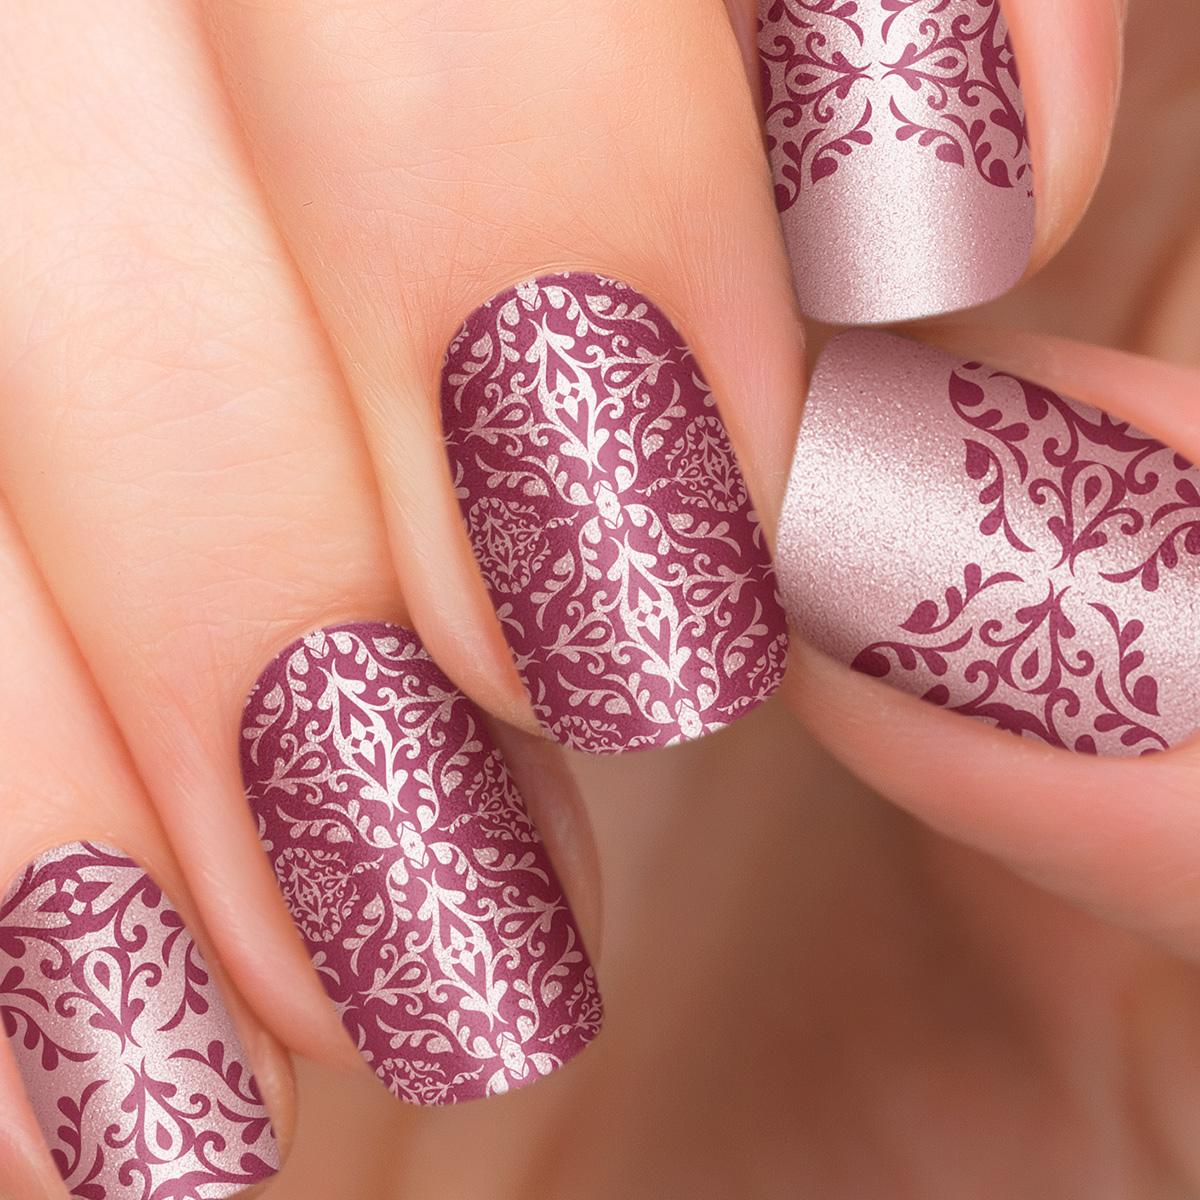 Incoco.com Incoco Nail Polish Strips, Arabesque